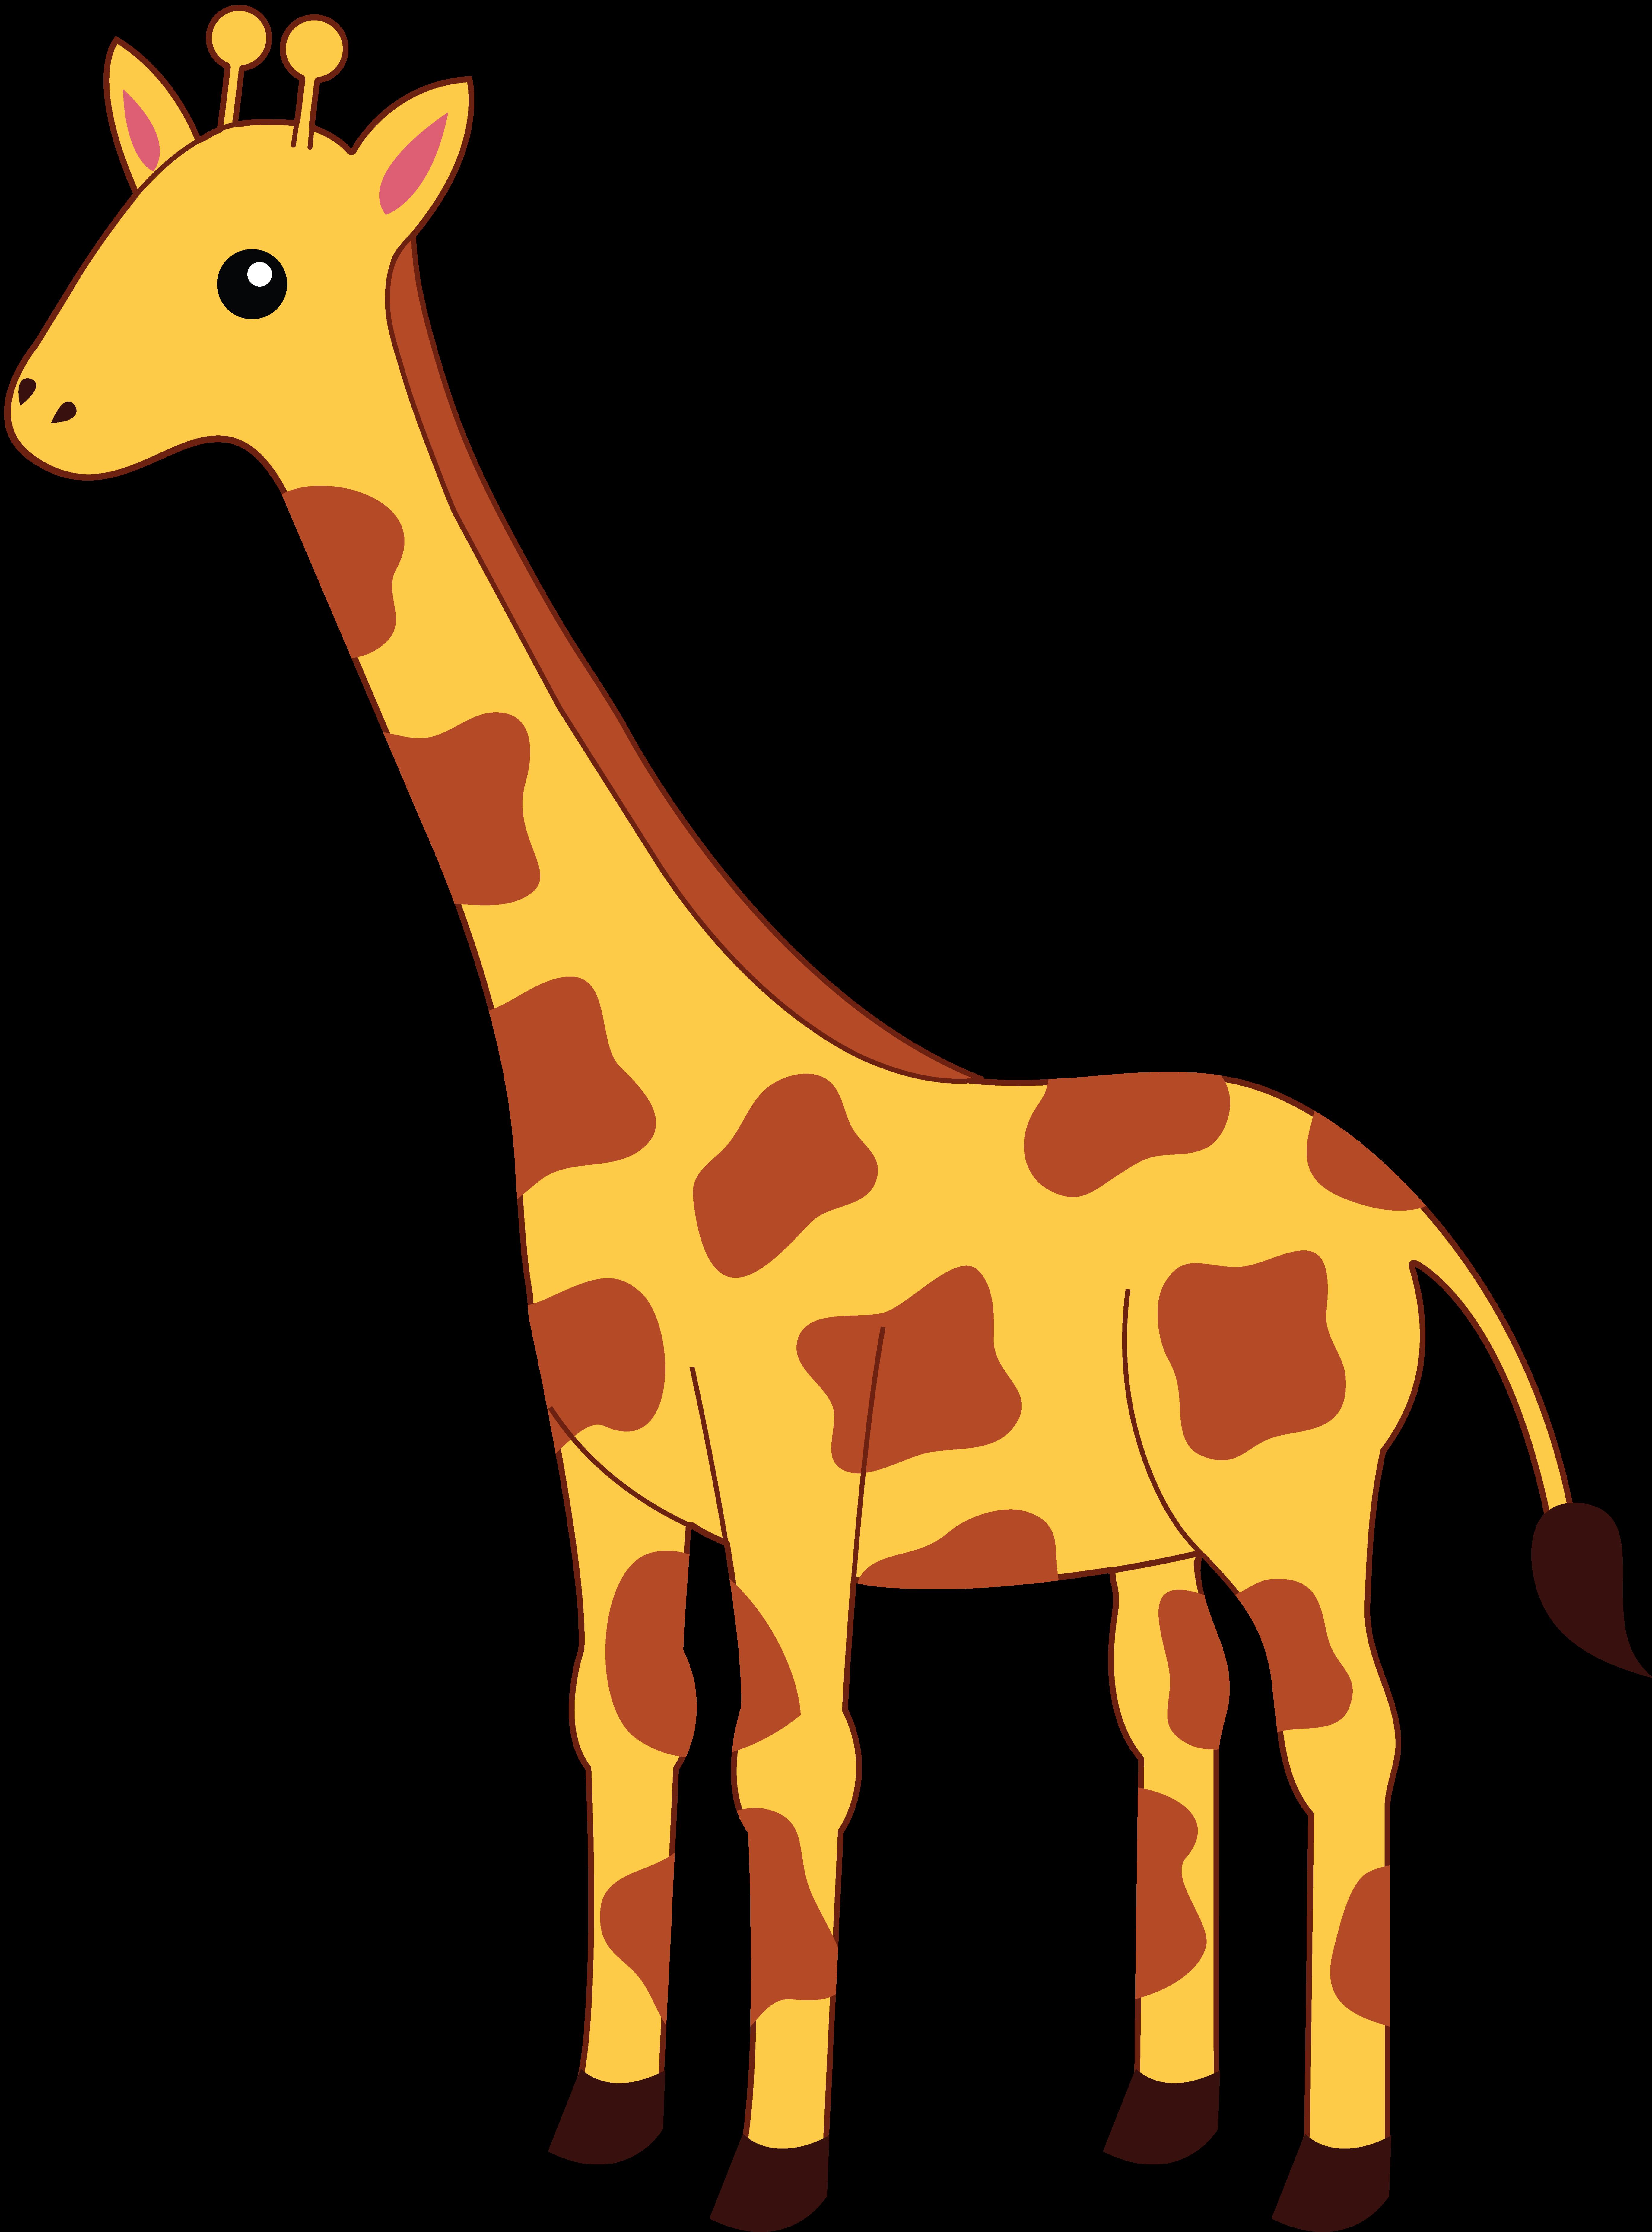 Baby Giraffe Clipart Panda .-Baby Giraffe Clipart Panda .-3